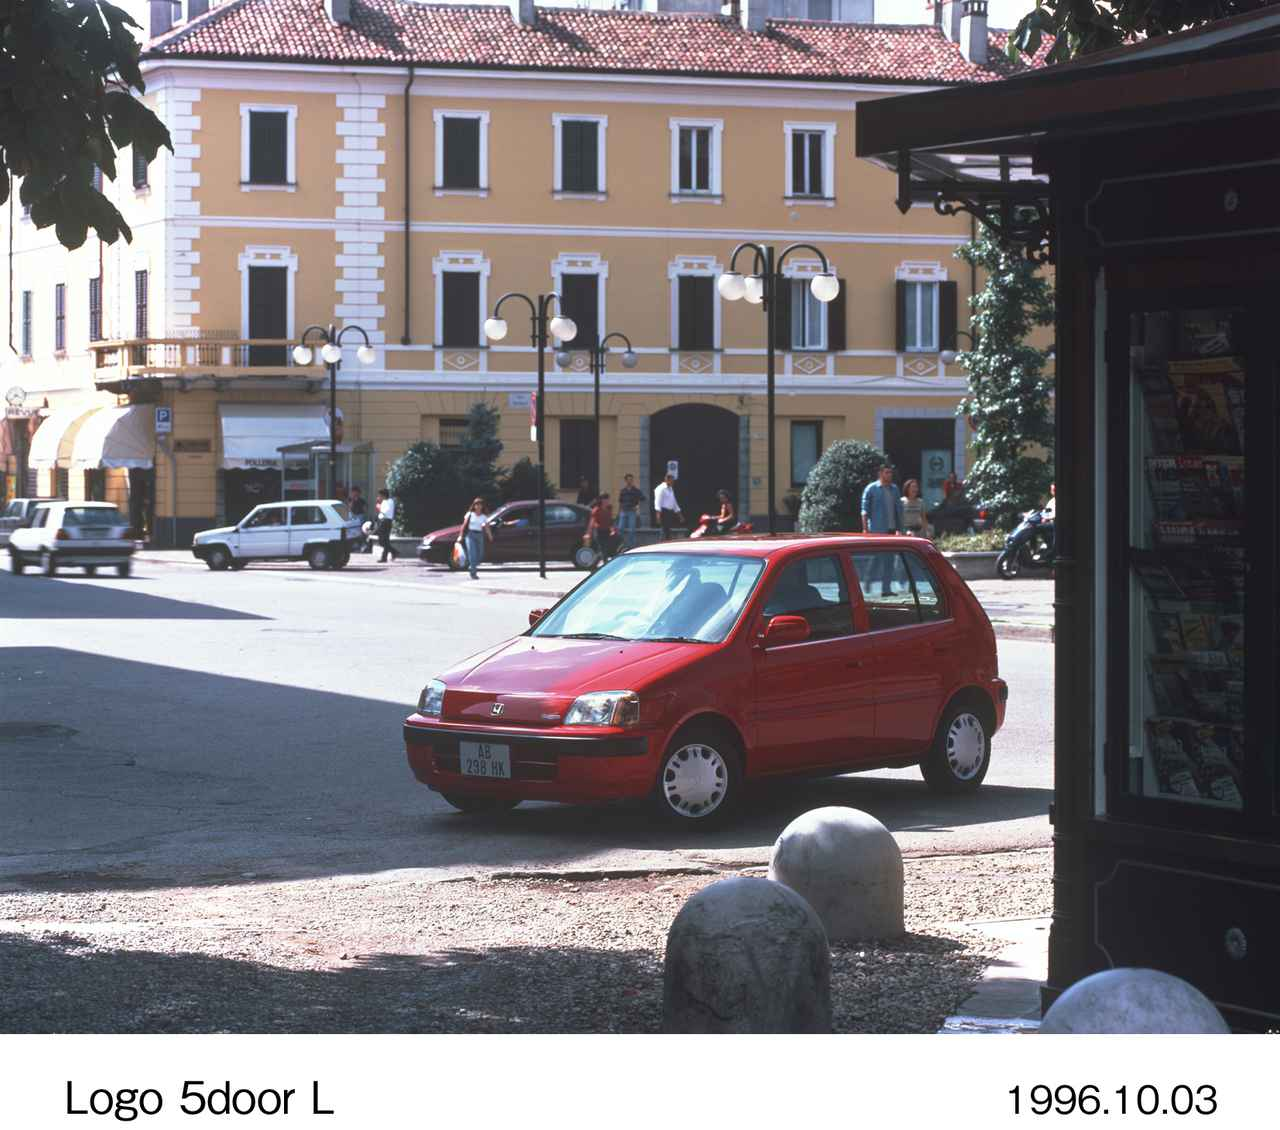 Images : 11番目の画像 - ホンダロゴ関連の画像はこちら(クリックして拡大) - A Little Honda | ア・リトル・ホンダ(リトホン)